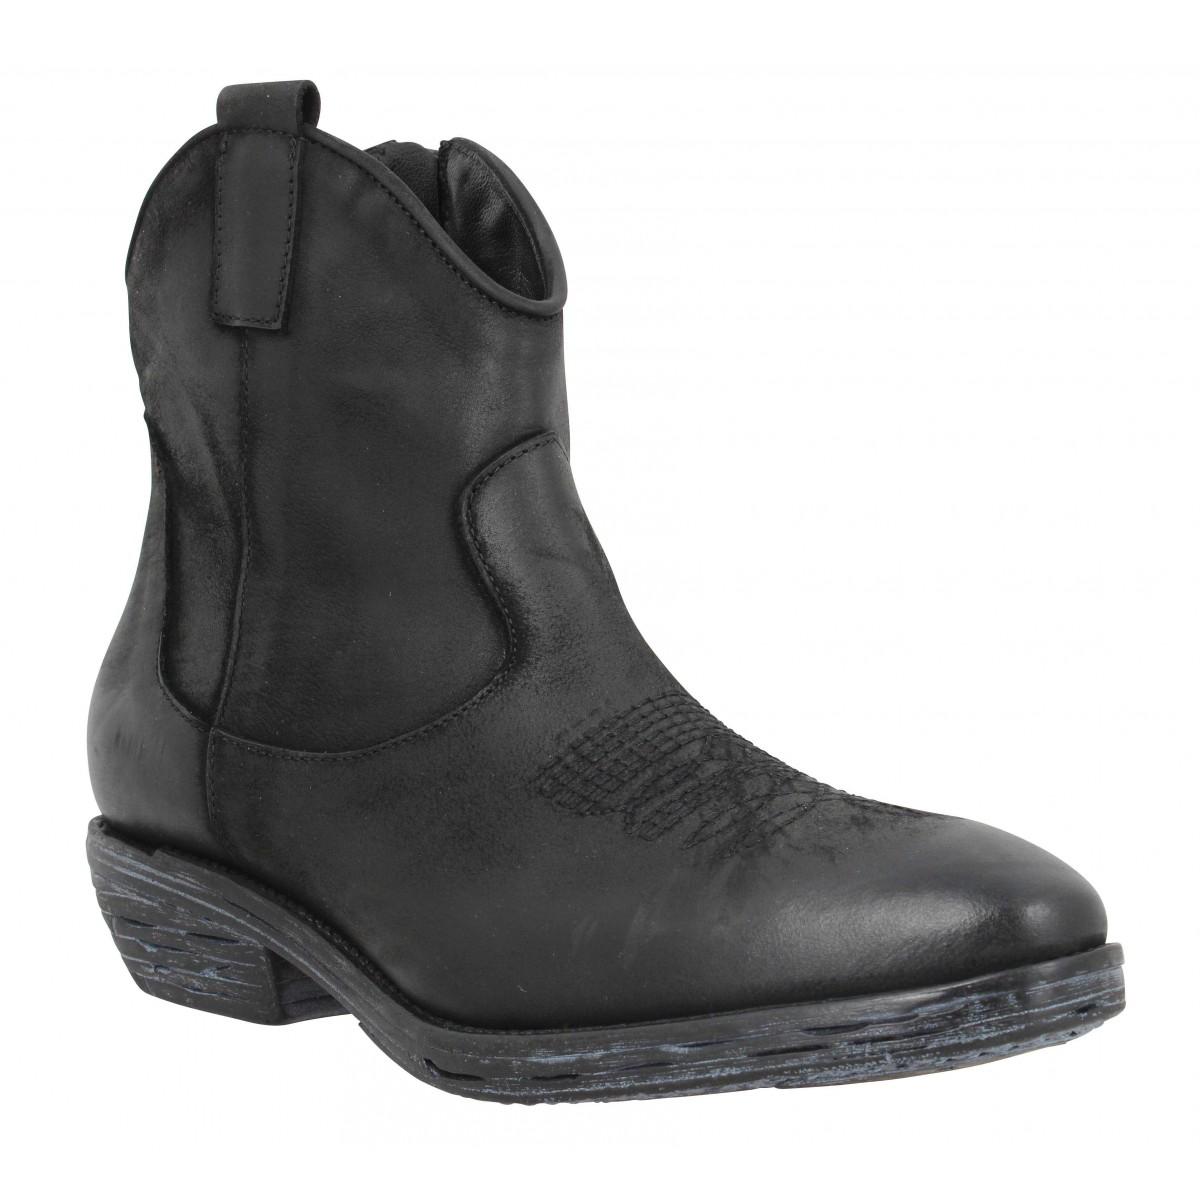 IMPICCI 122 cuir Femme-35-Noir